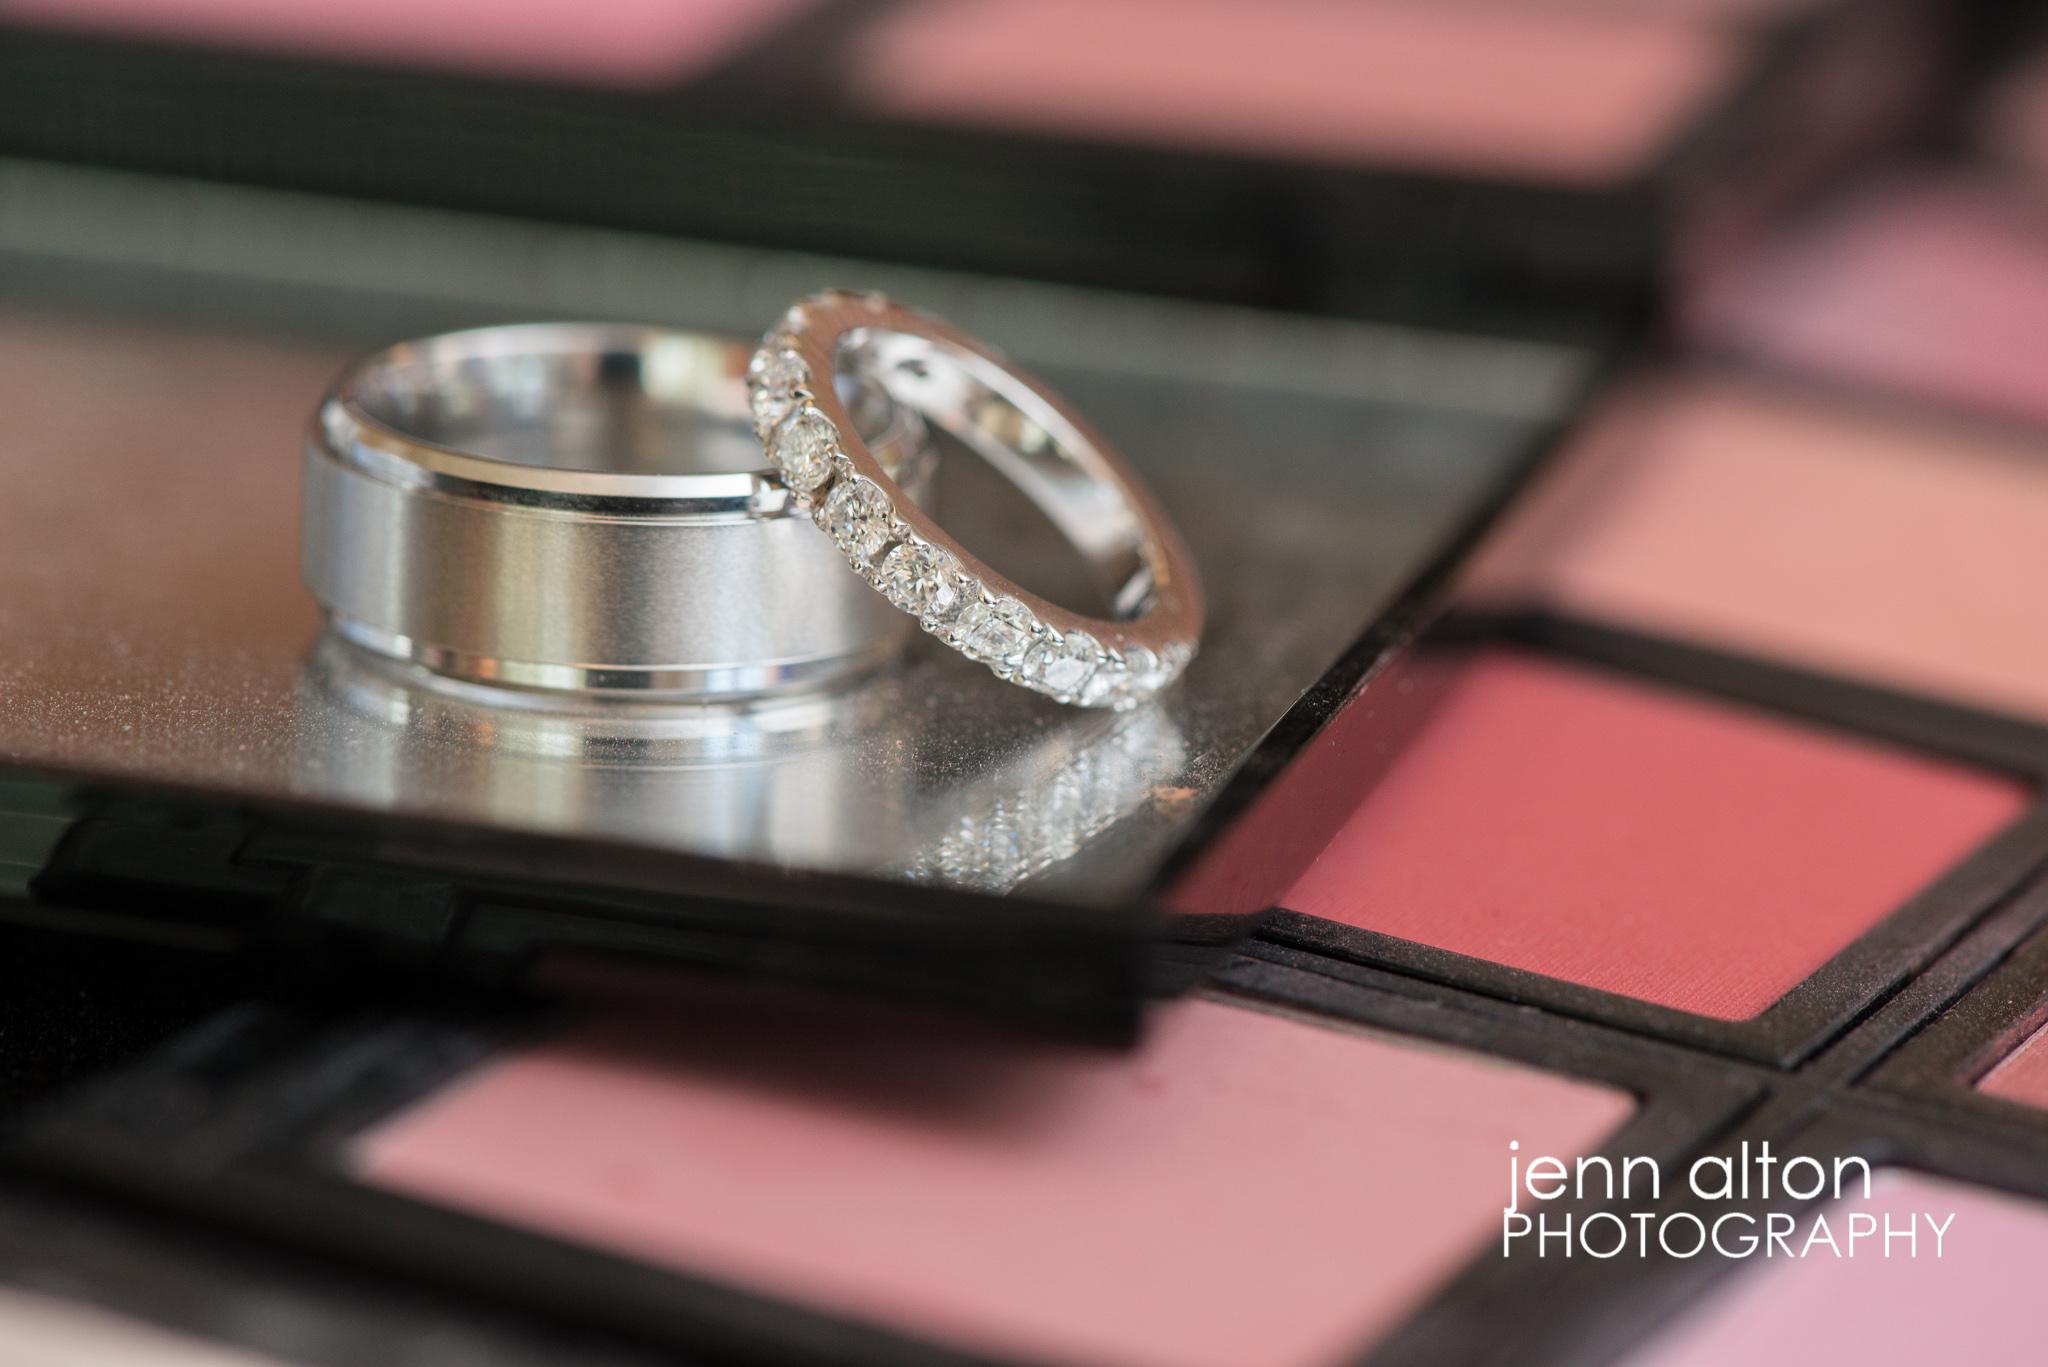 Wedding Bands macro shot on makeup palet